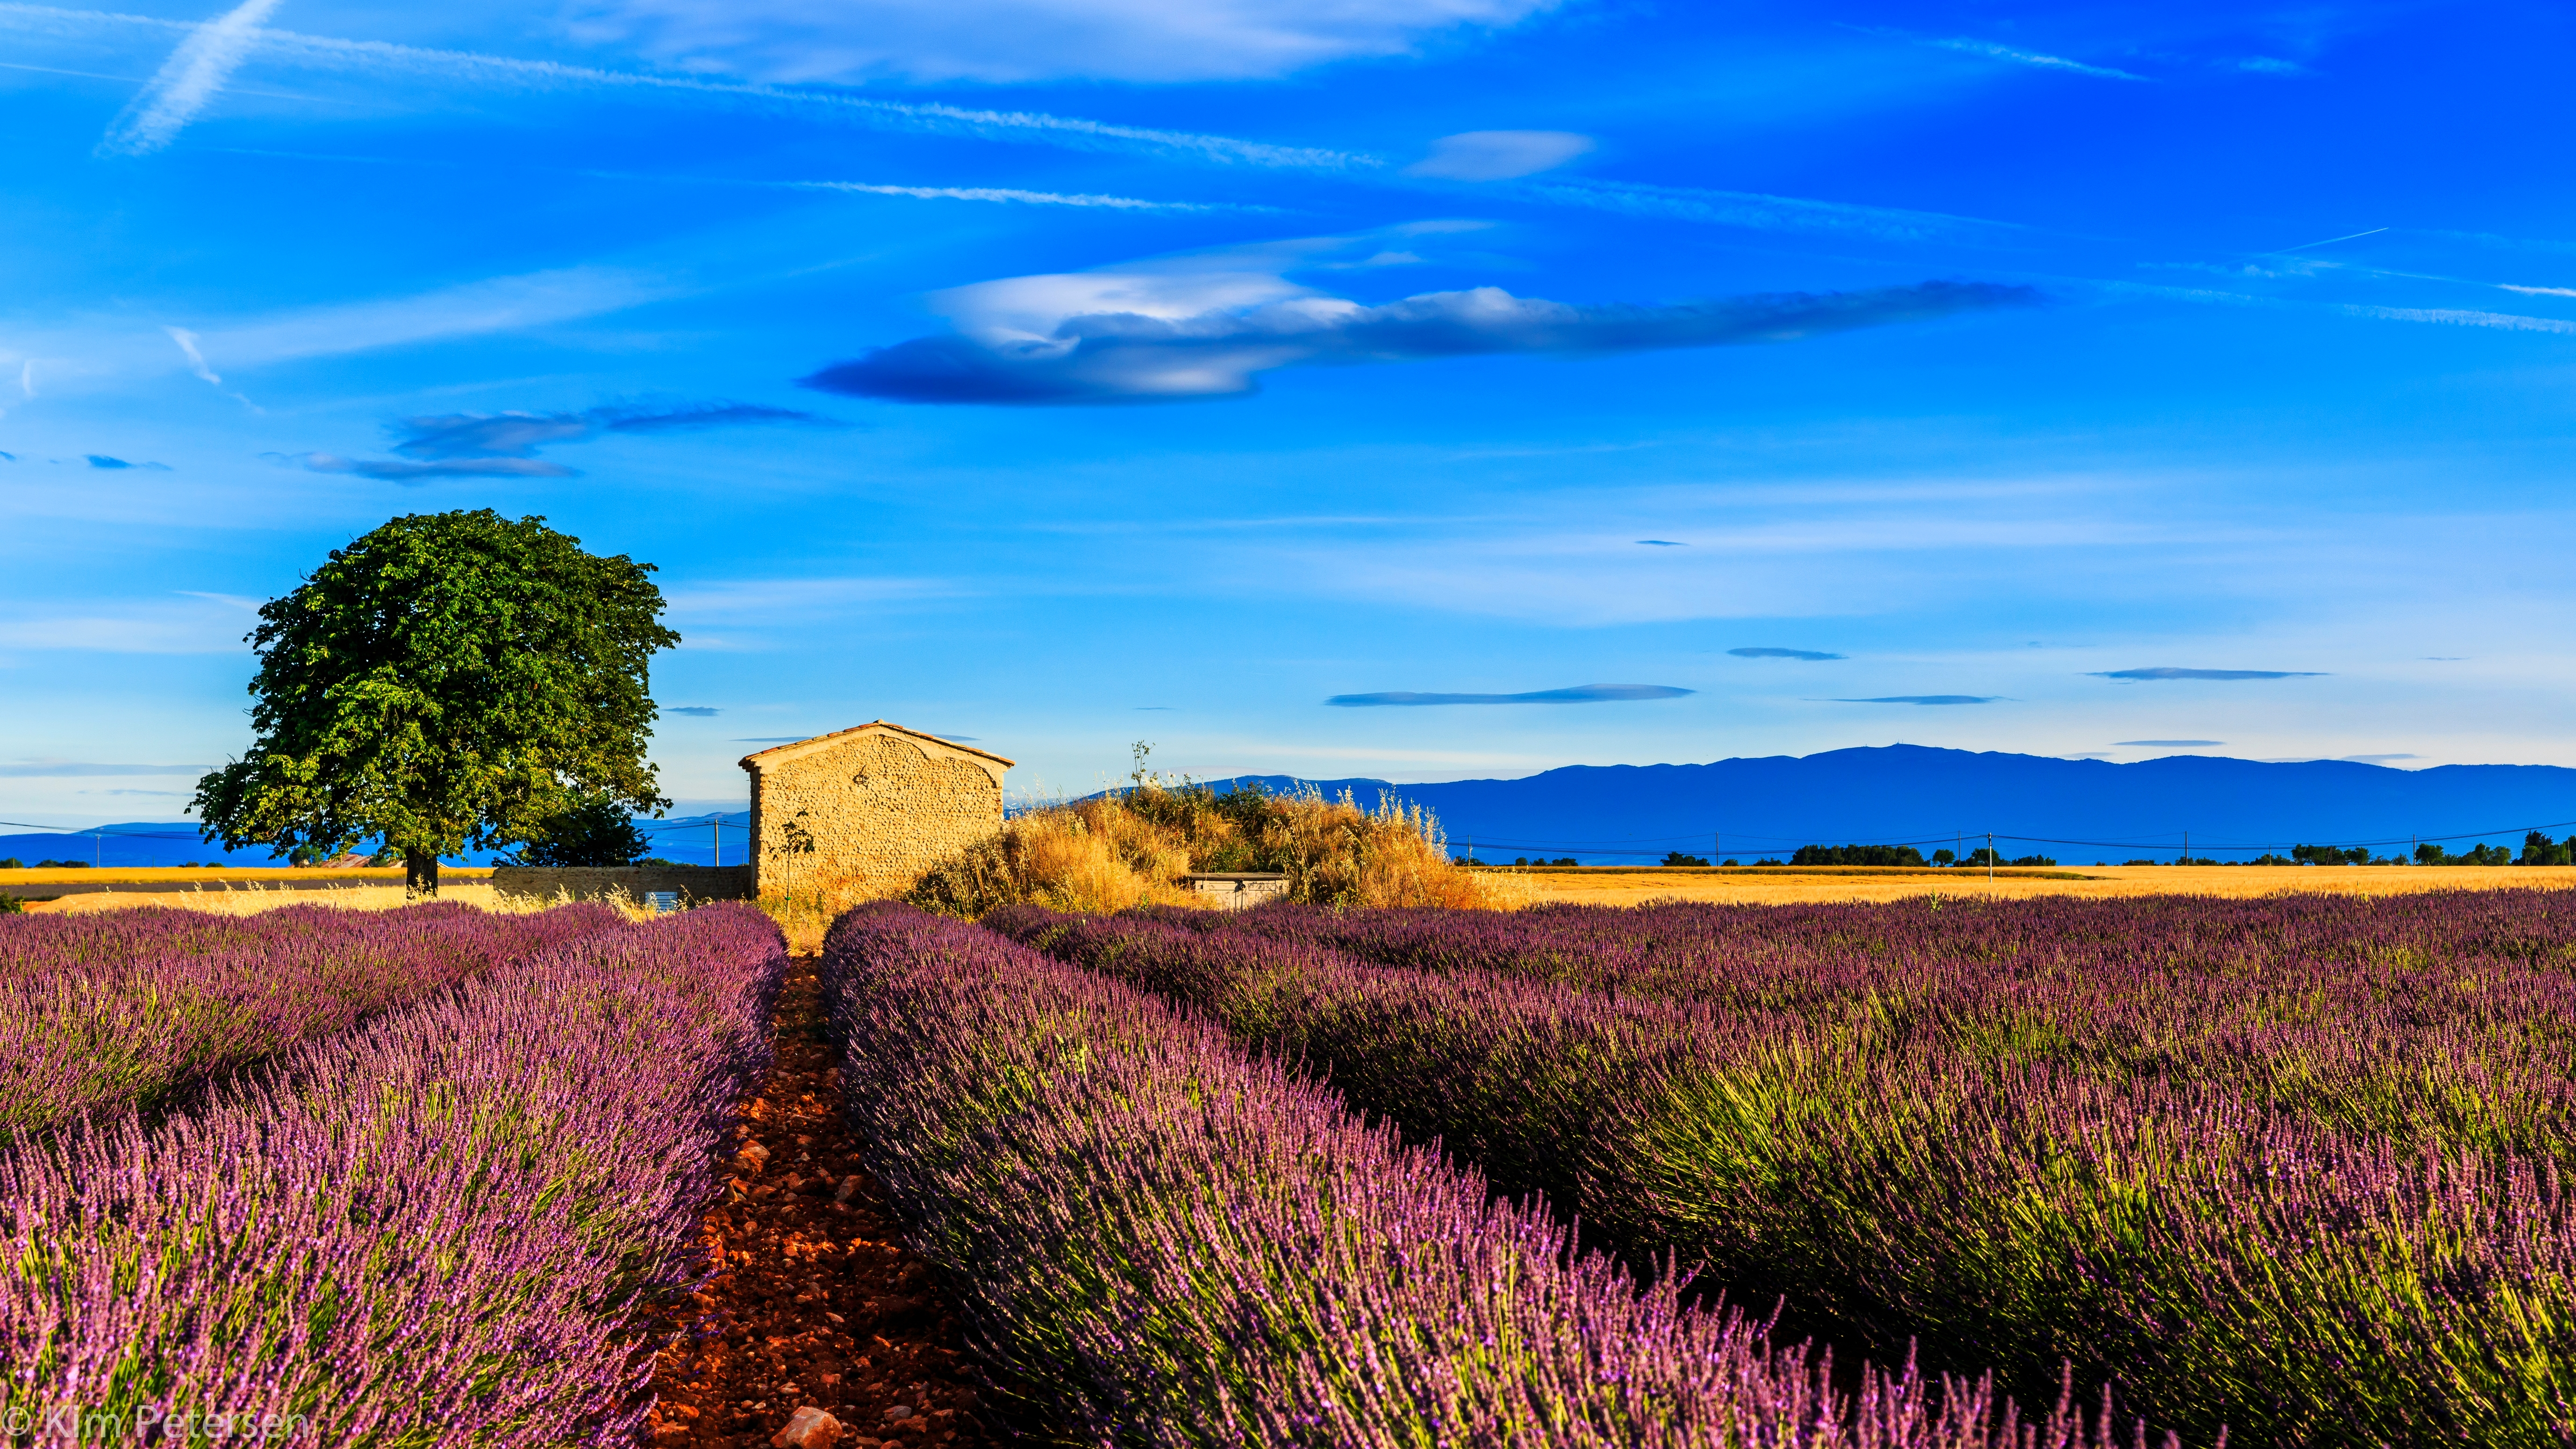 Download wallpaper 5512x3101 france provence field grass sky 5512x3101